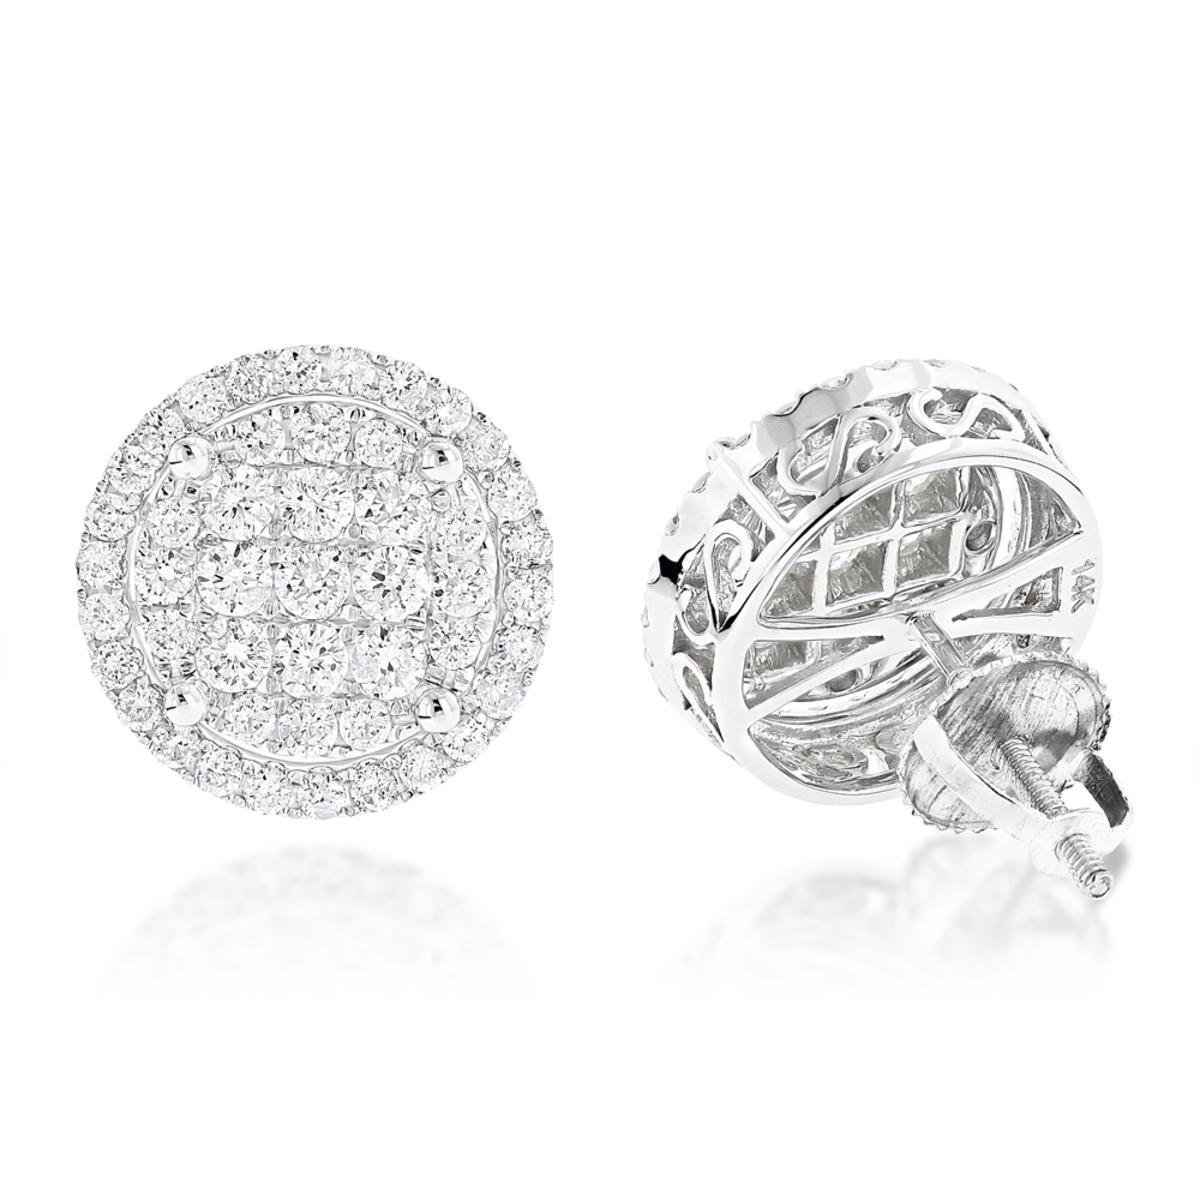 Halo Diamond Cluster Earrings Studs 1.61ct 14K Gold